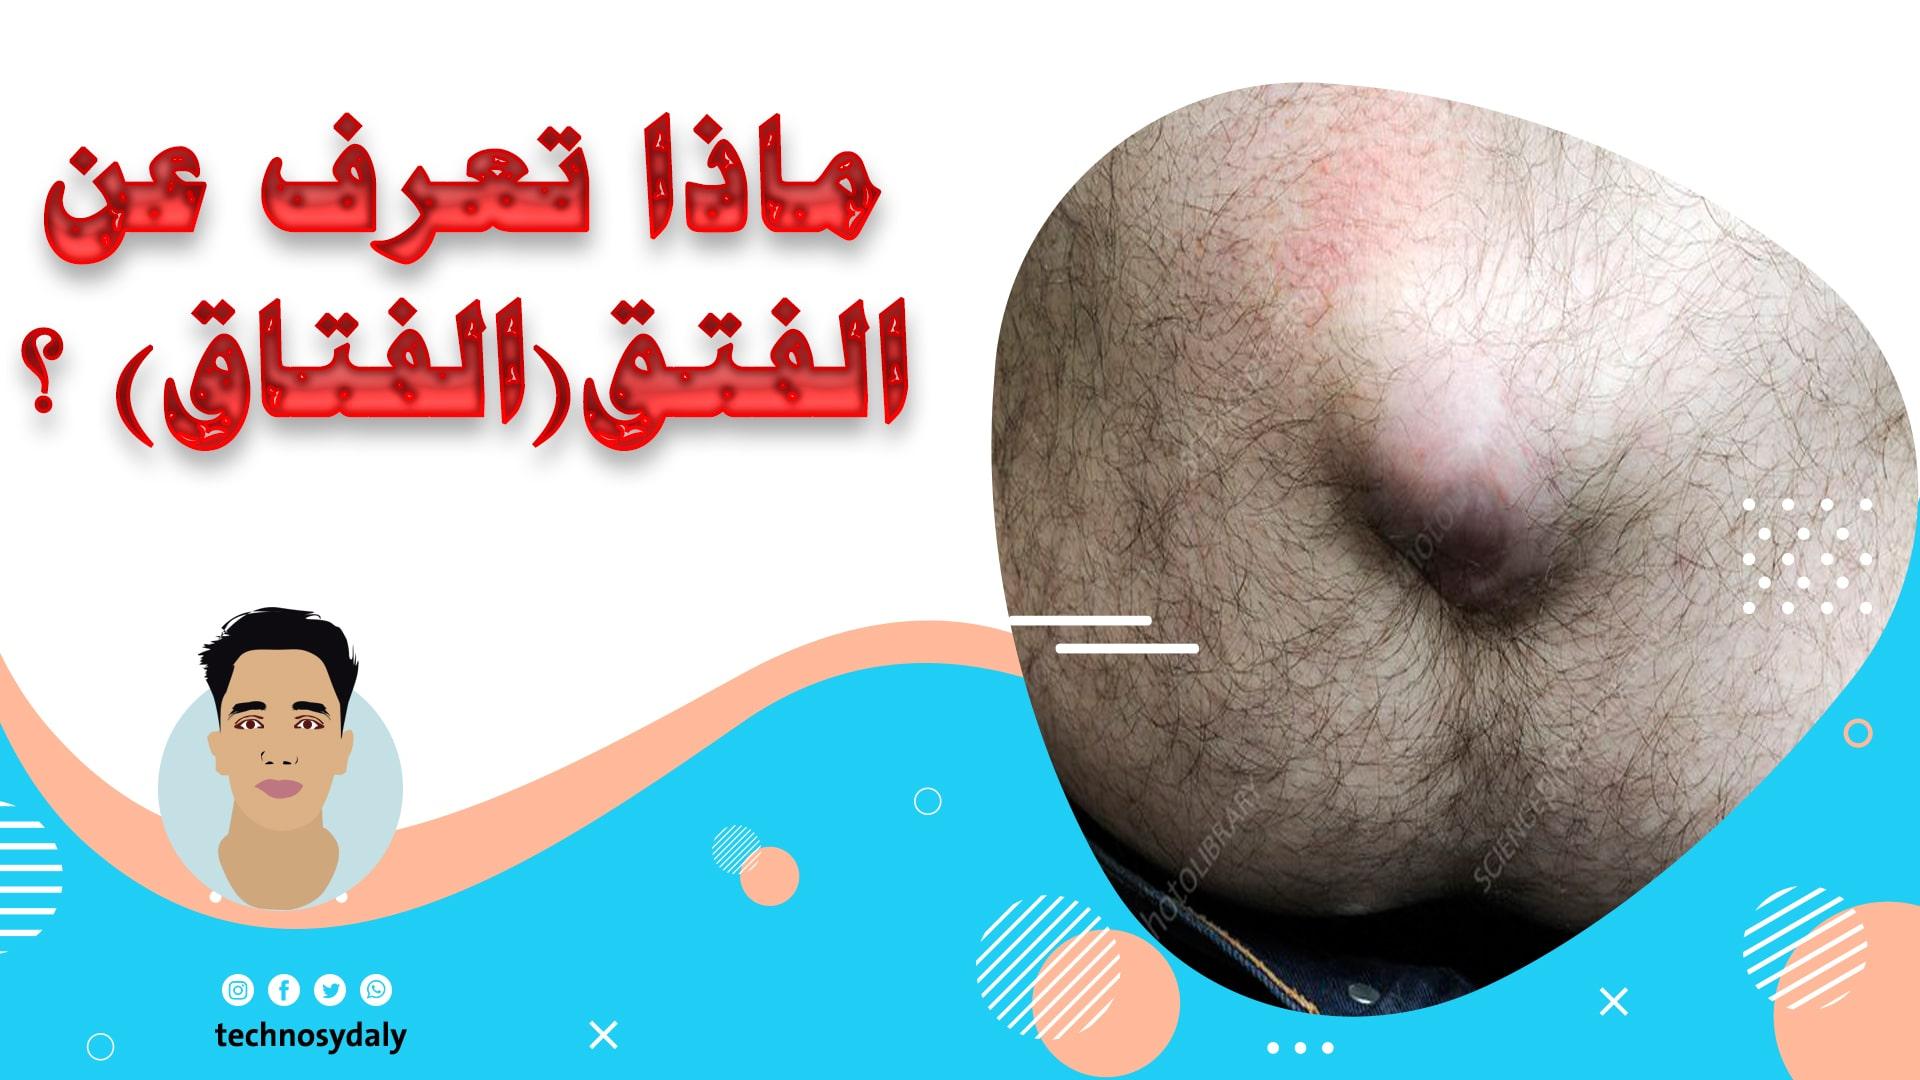 ماذا تعرف عن الفتق(الفتاق) ؟ What do you know about hernia